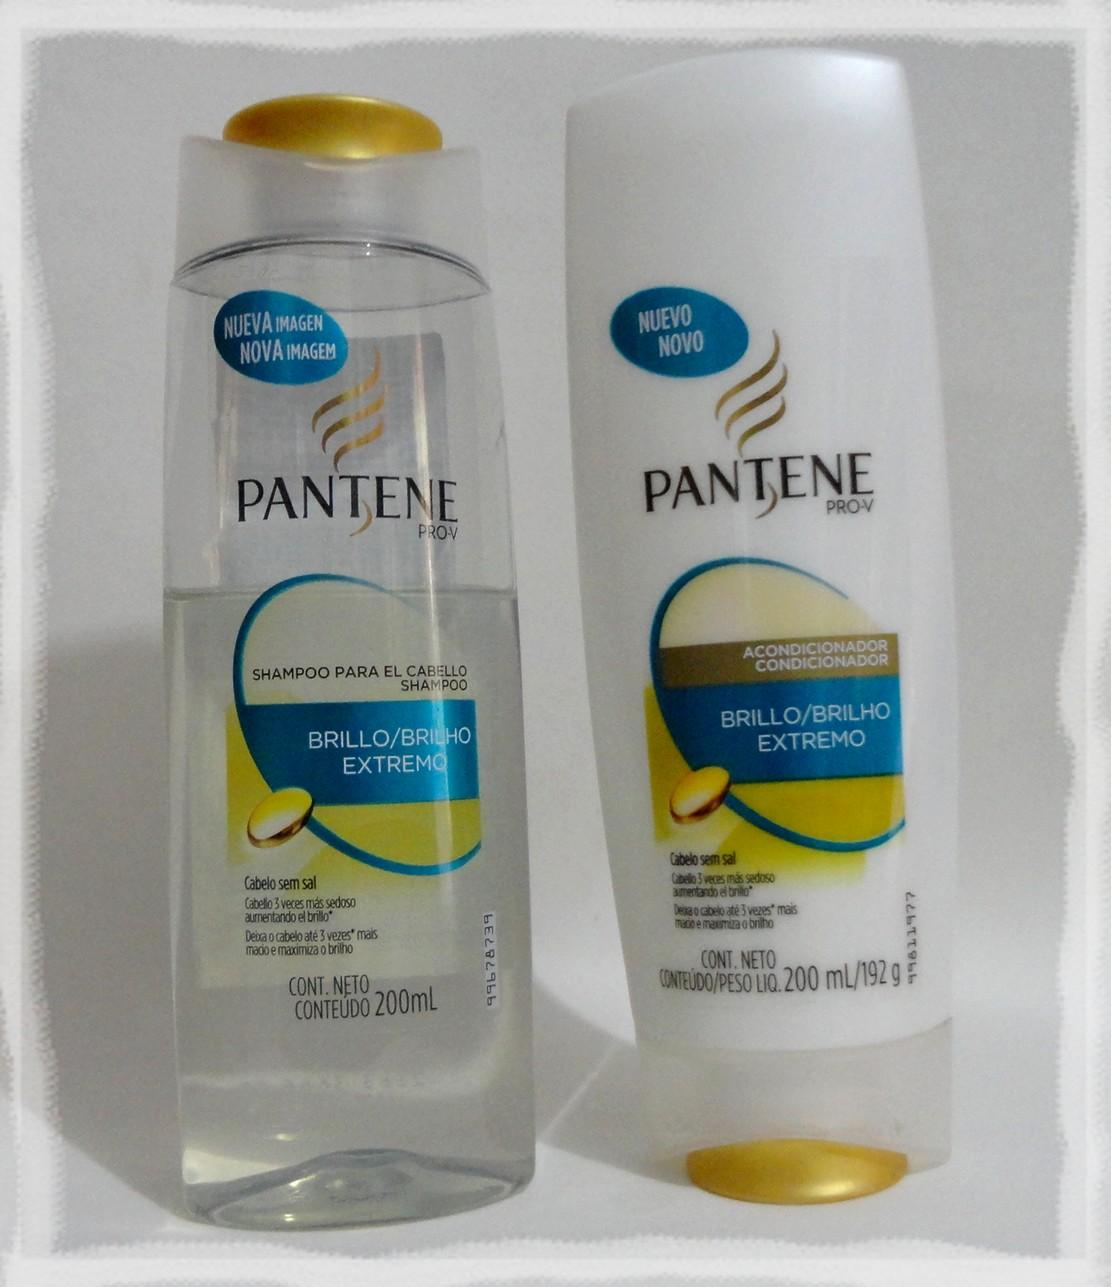 Conhecido Blog Vanessa Sial : Testei Xampu e Condicionador Pantene Pró V  AX91